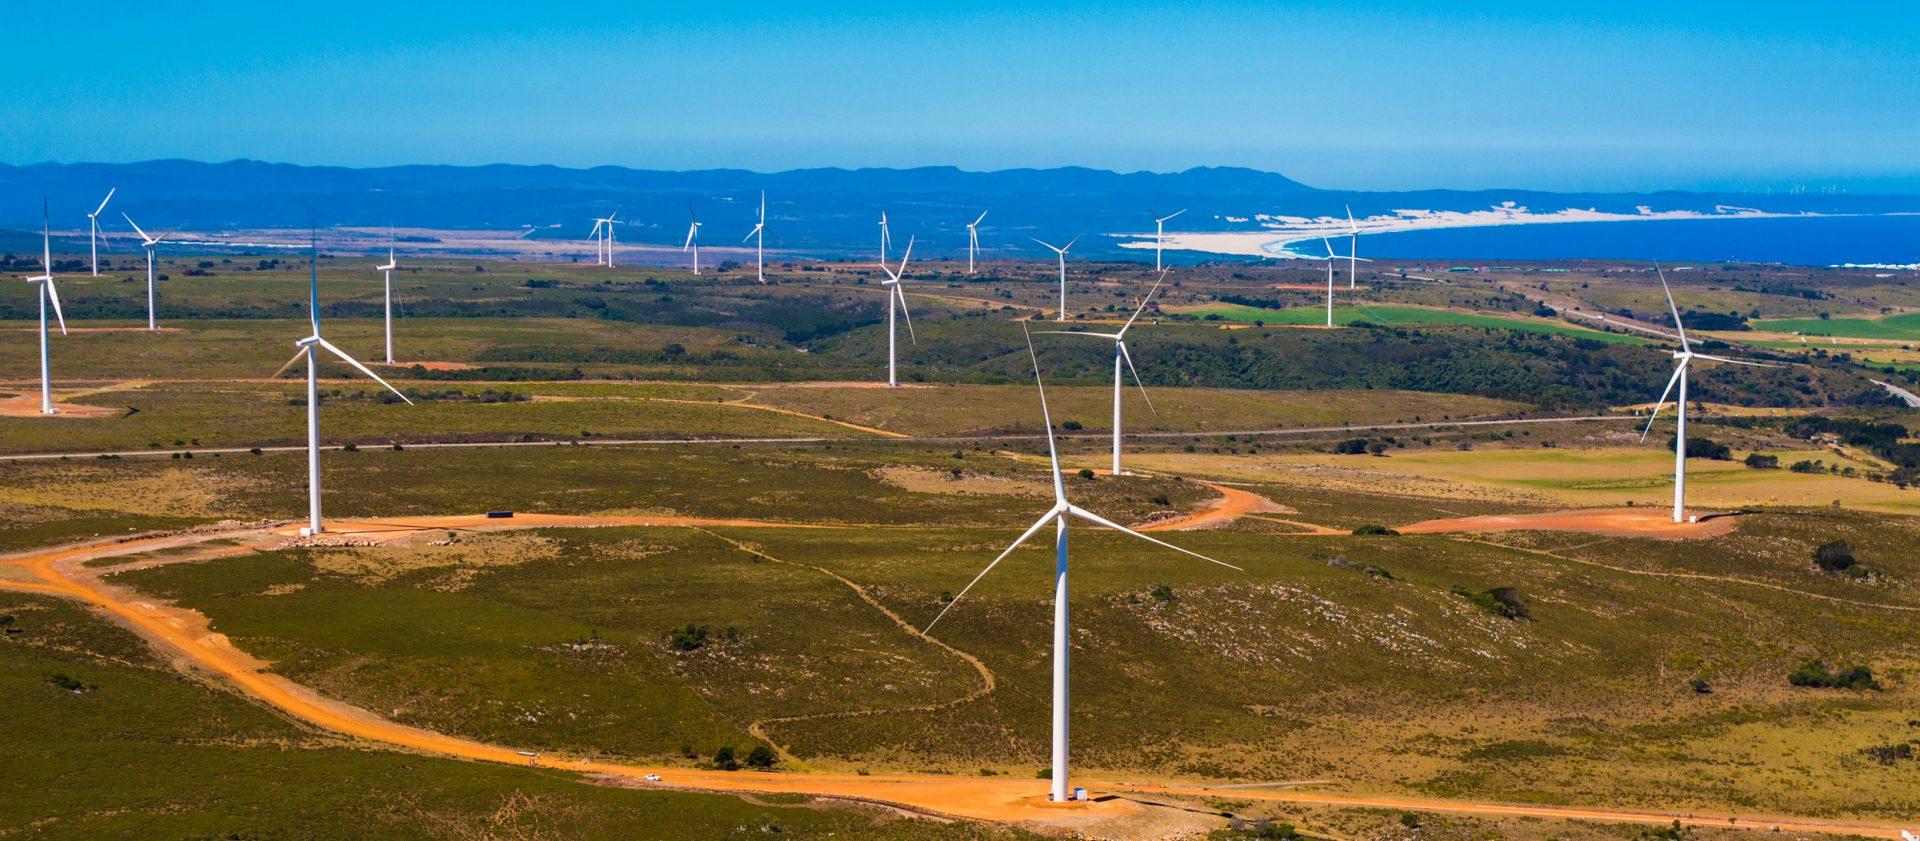 Wind turbines on an African plain